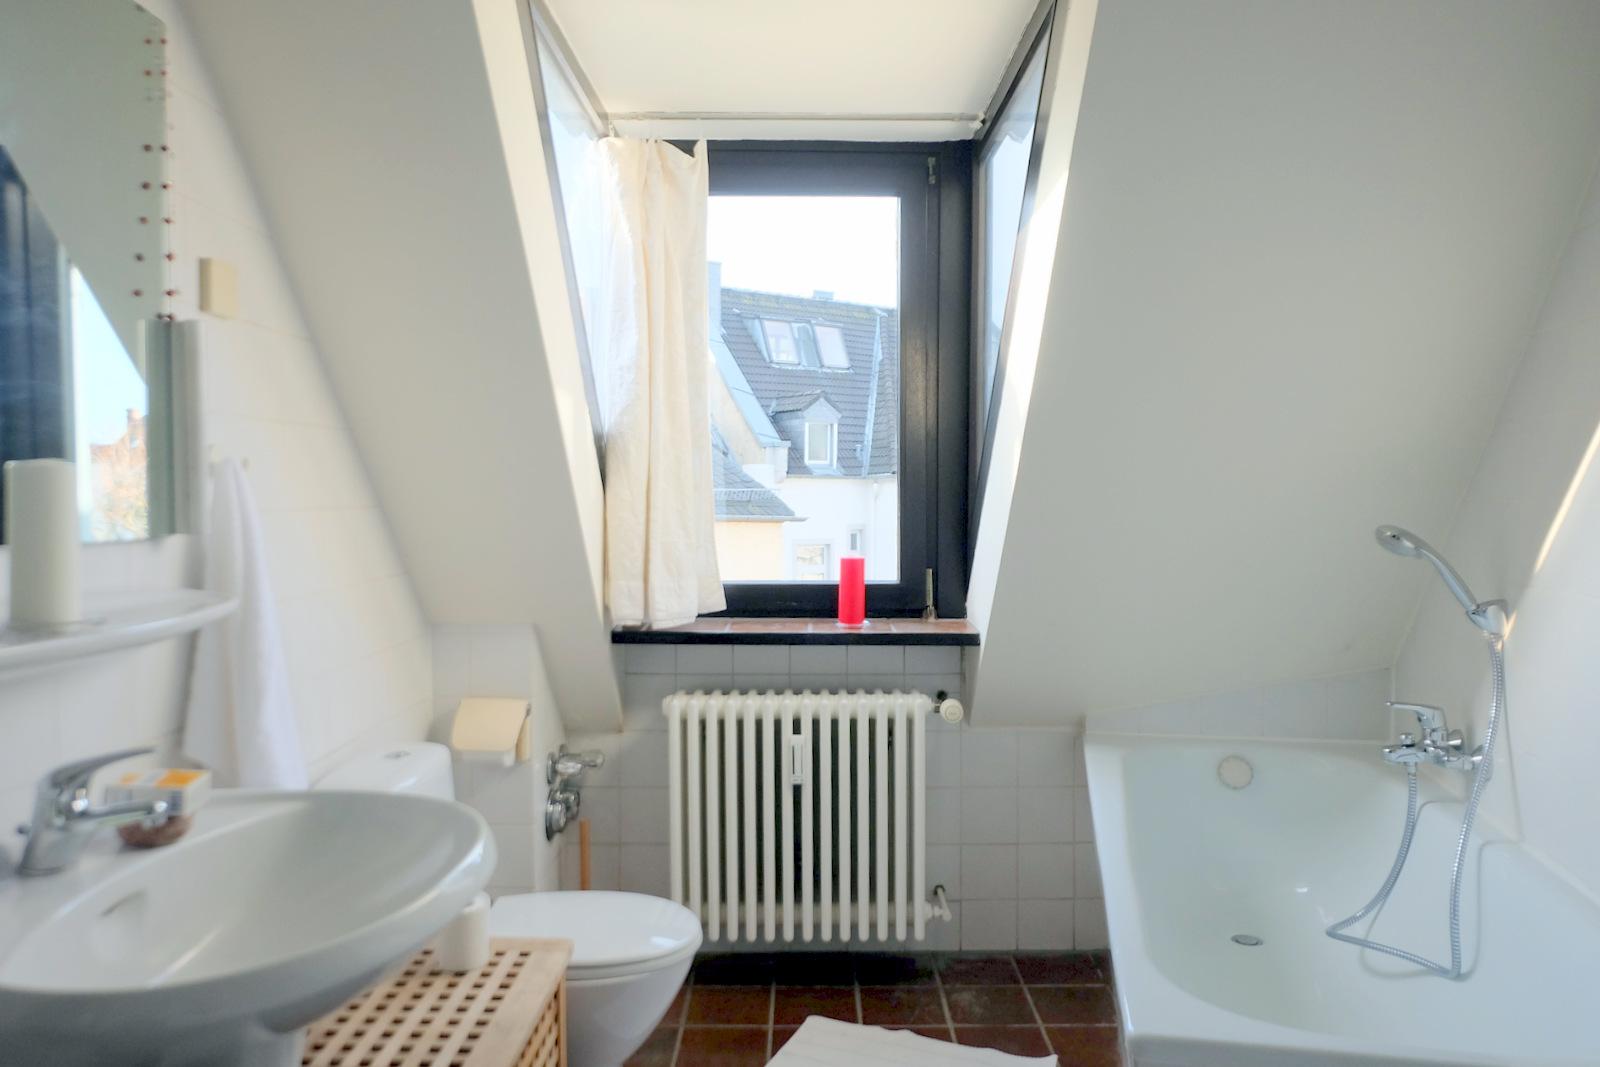 dscf1527 Roof apartment %Bockenheim